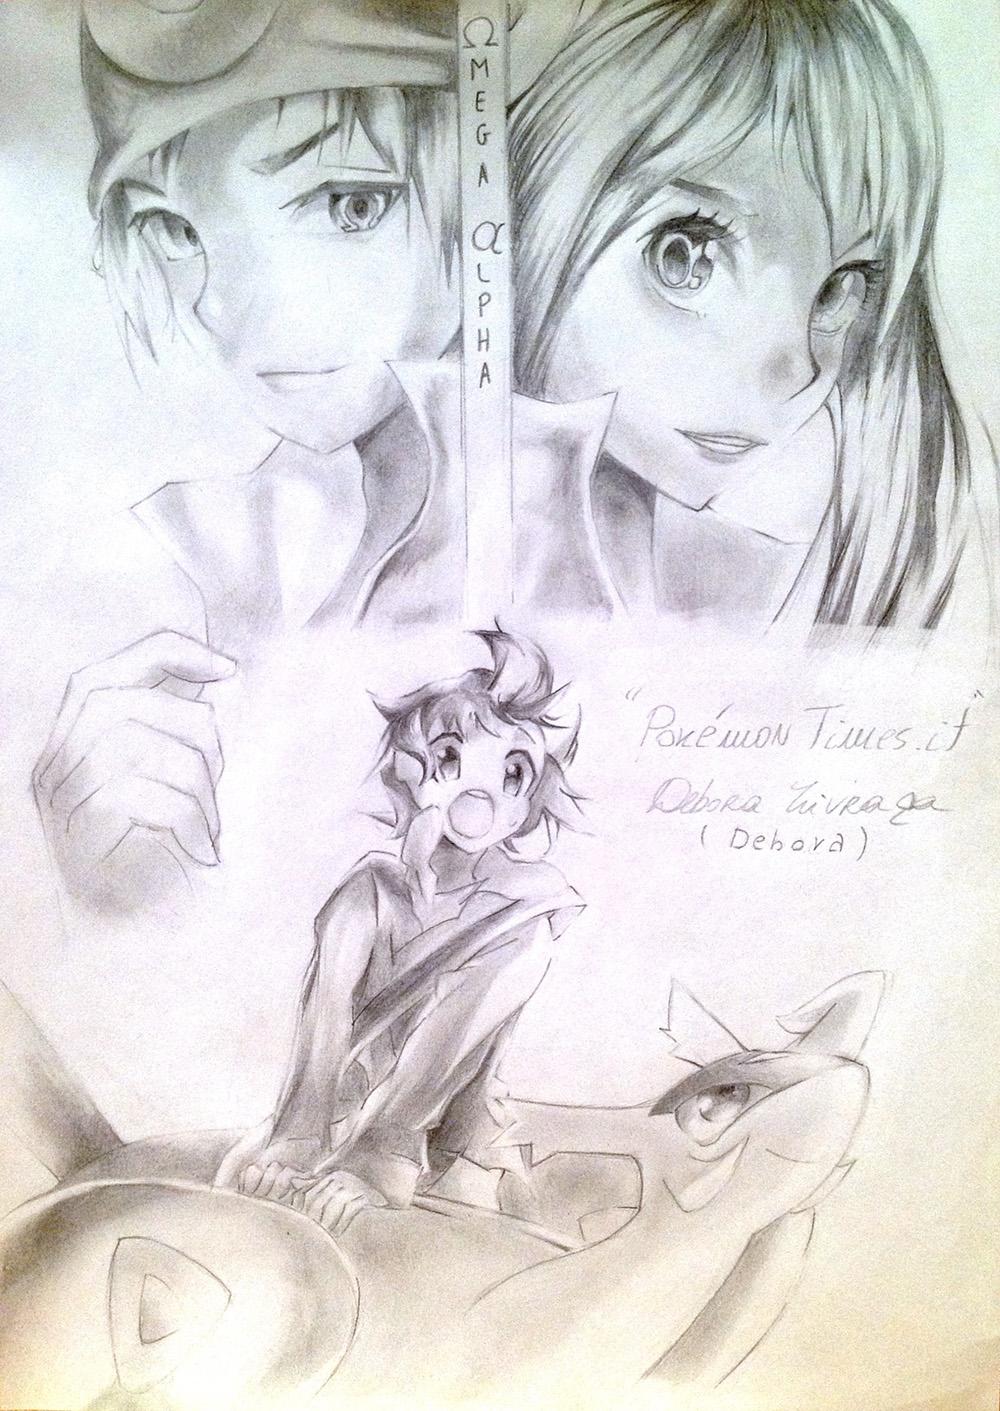 Debora Illustrazione Pokemontimes It Pokemon Times